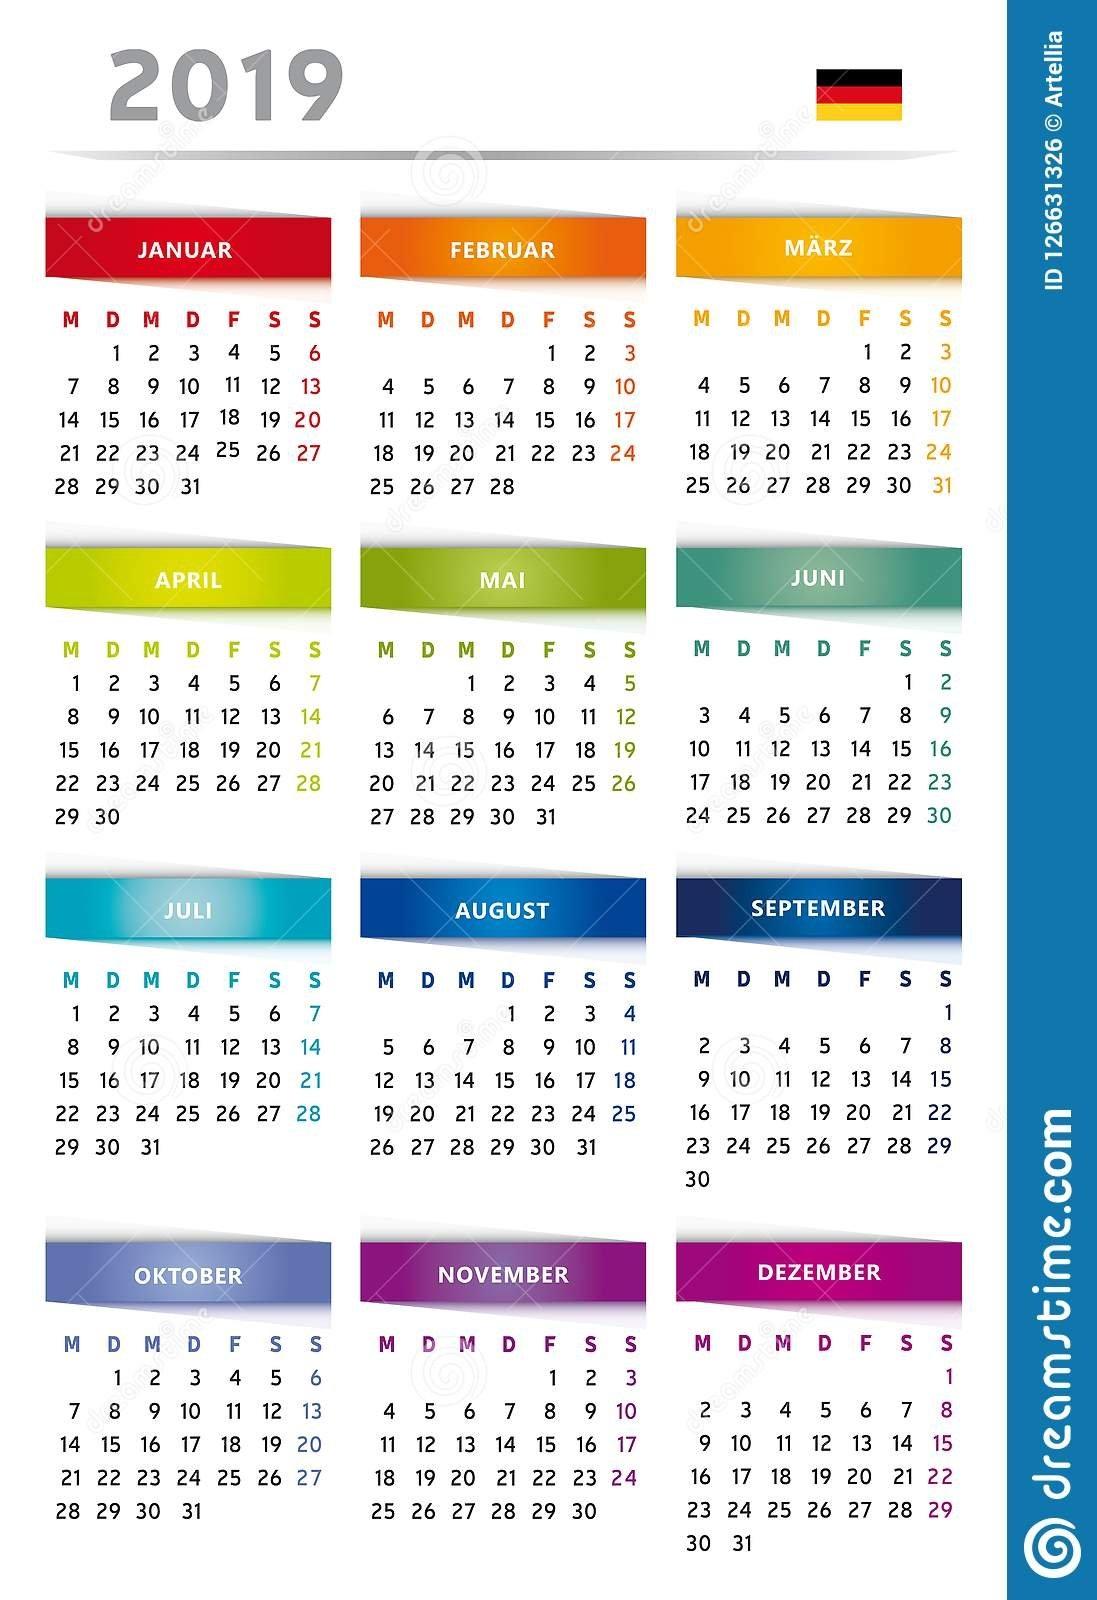 2019 Calendar With Boxes In Rainbow Colors 4 Trimesters – 3 Columns 4 Column Calendar 2019